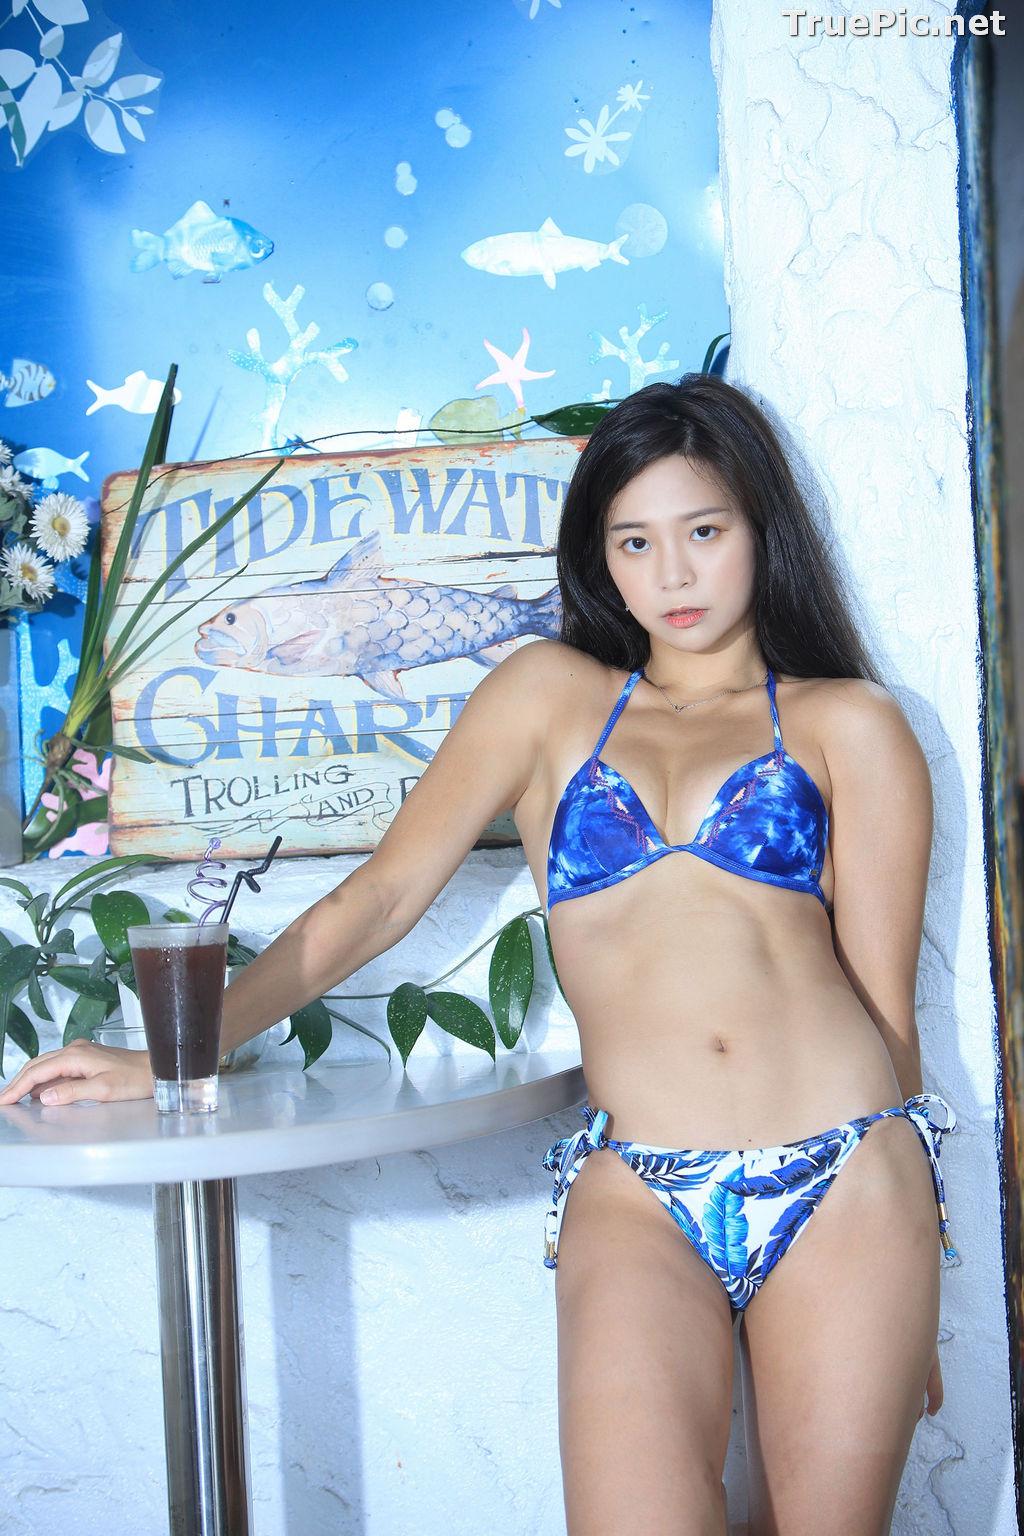 Image Taiwanese Model - Shelly - Beautiful Bodybuilding Bikini Girl - TruePic.net - Picture-54